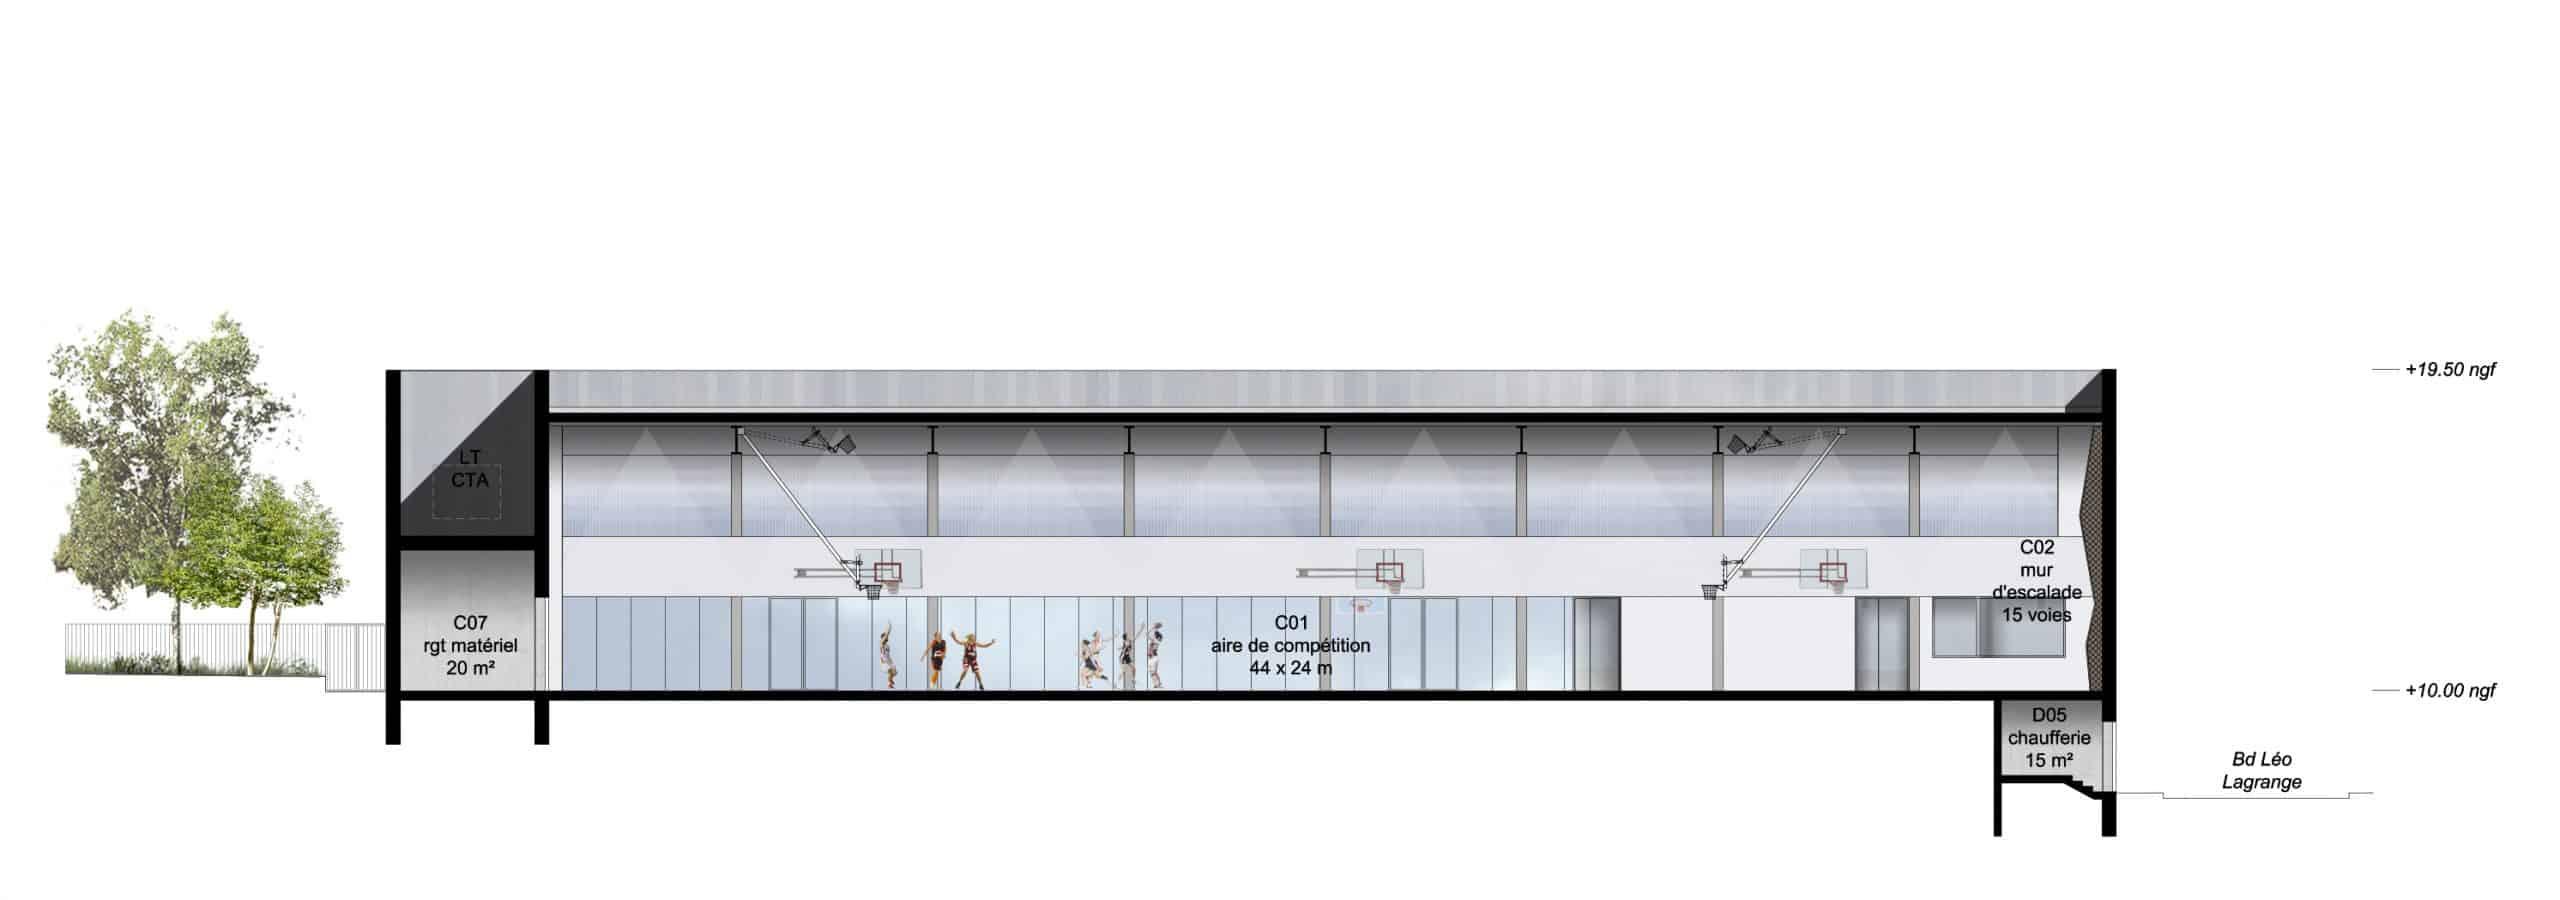 guillaume pepin architecte concours gymnase martigues 05